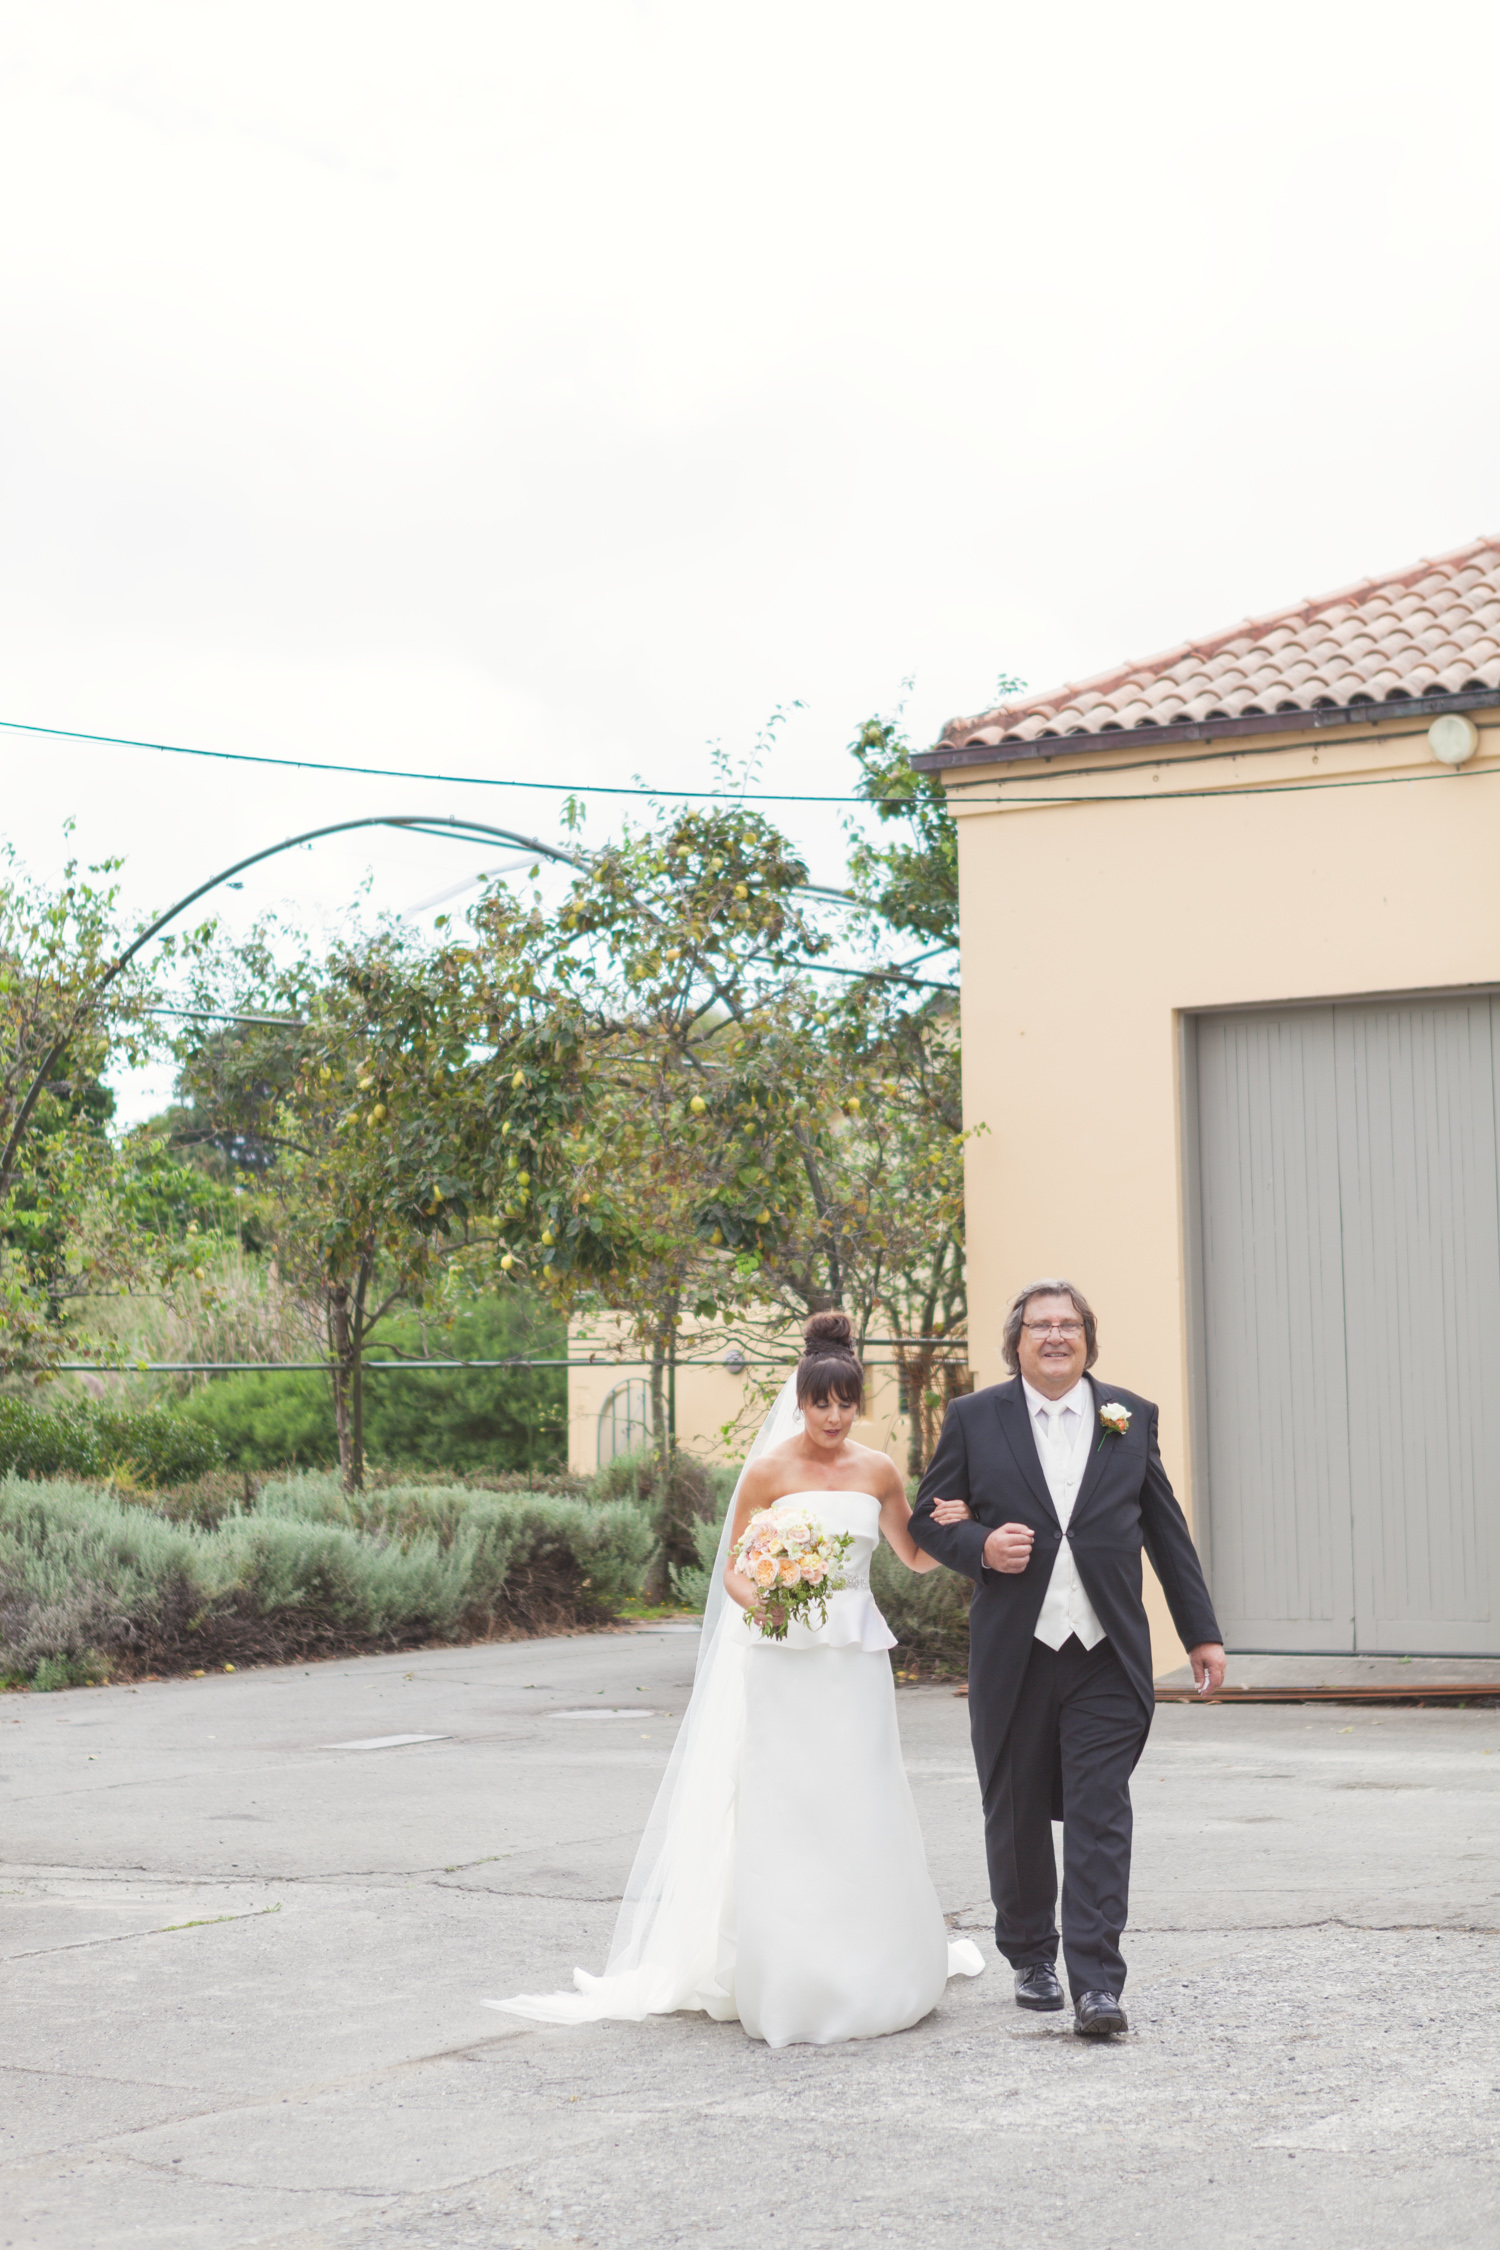 Bride walking down wedding aisle at The Milk Station